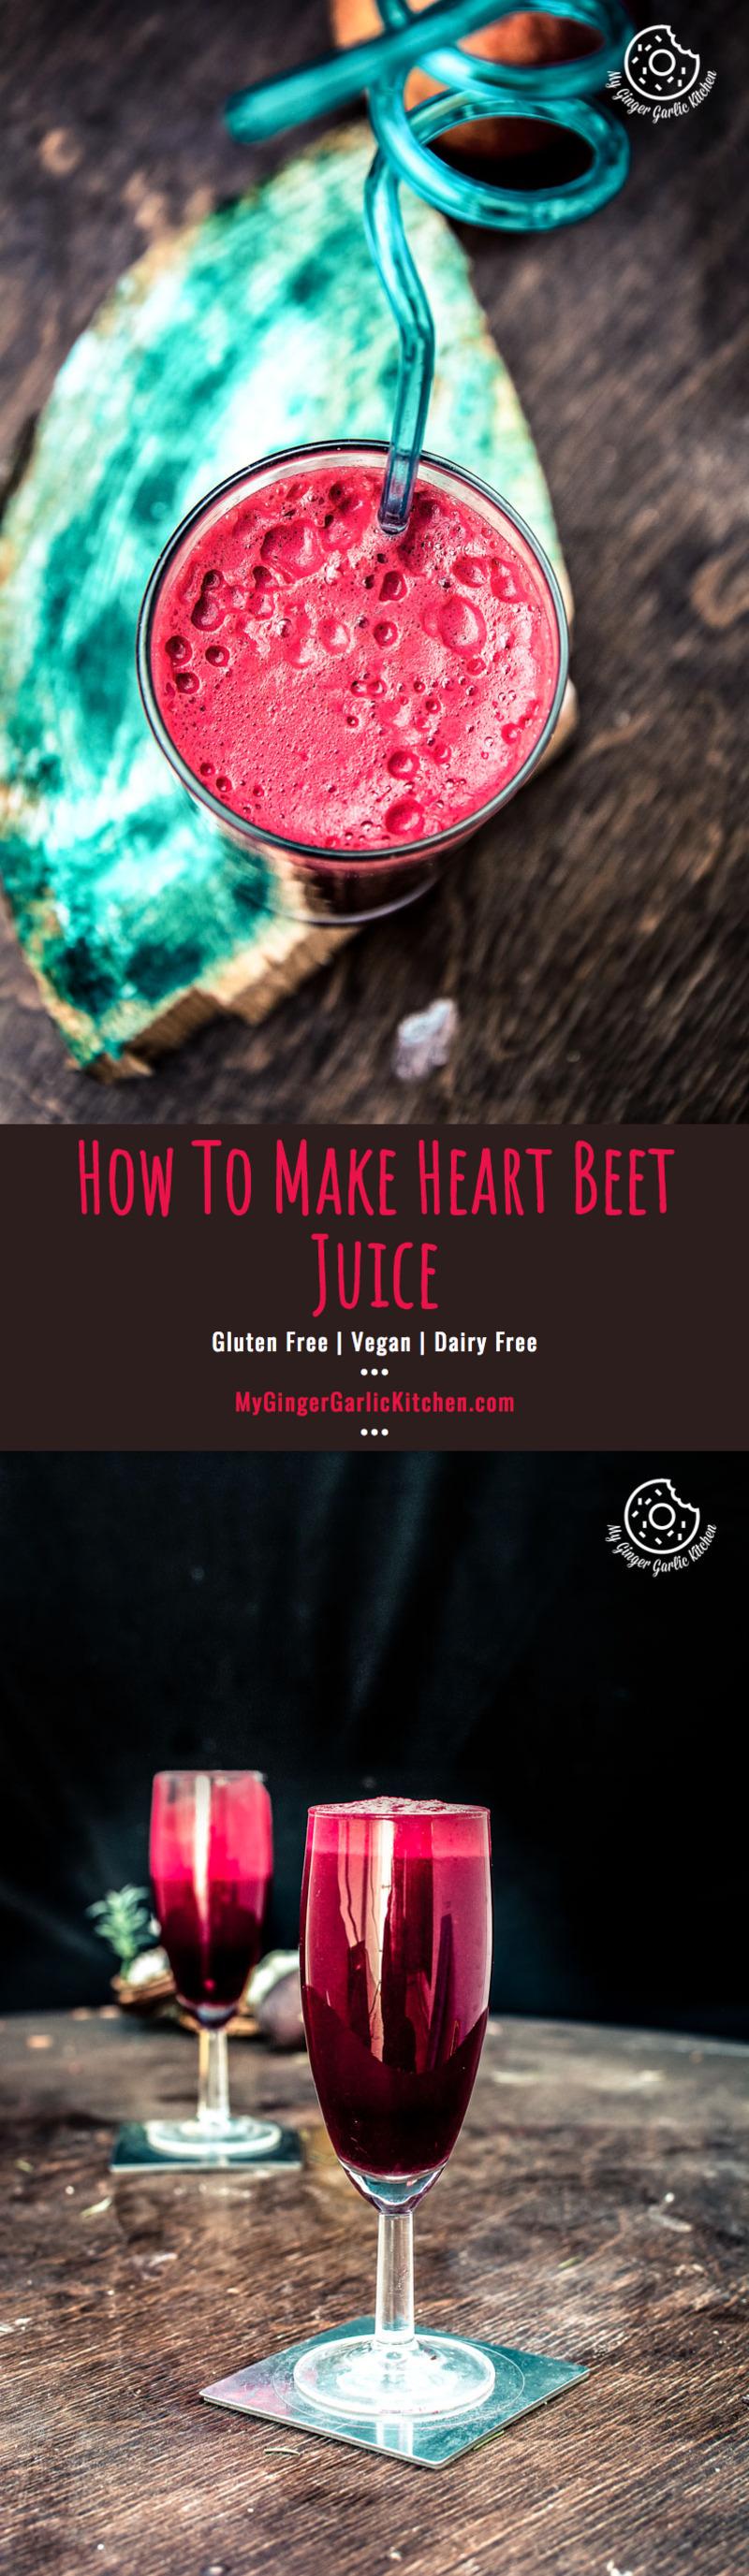 How To Make Detox Heart Beet Juice   mygingergarlickitchen.com/ @anupama_dreams